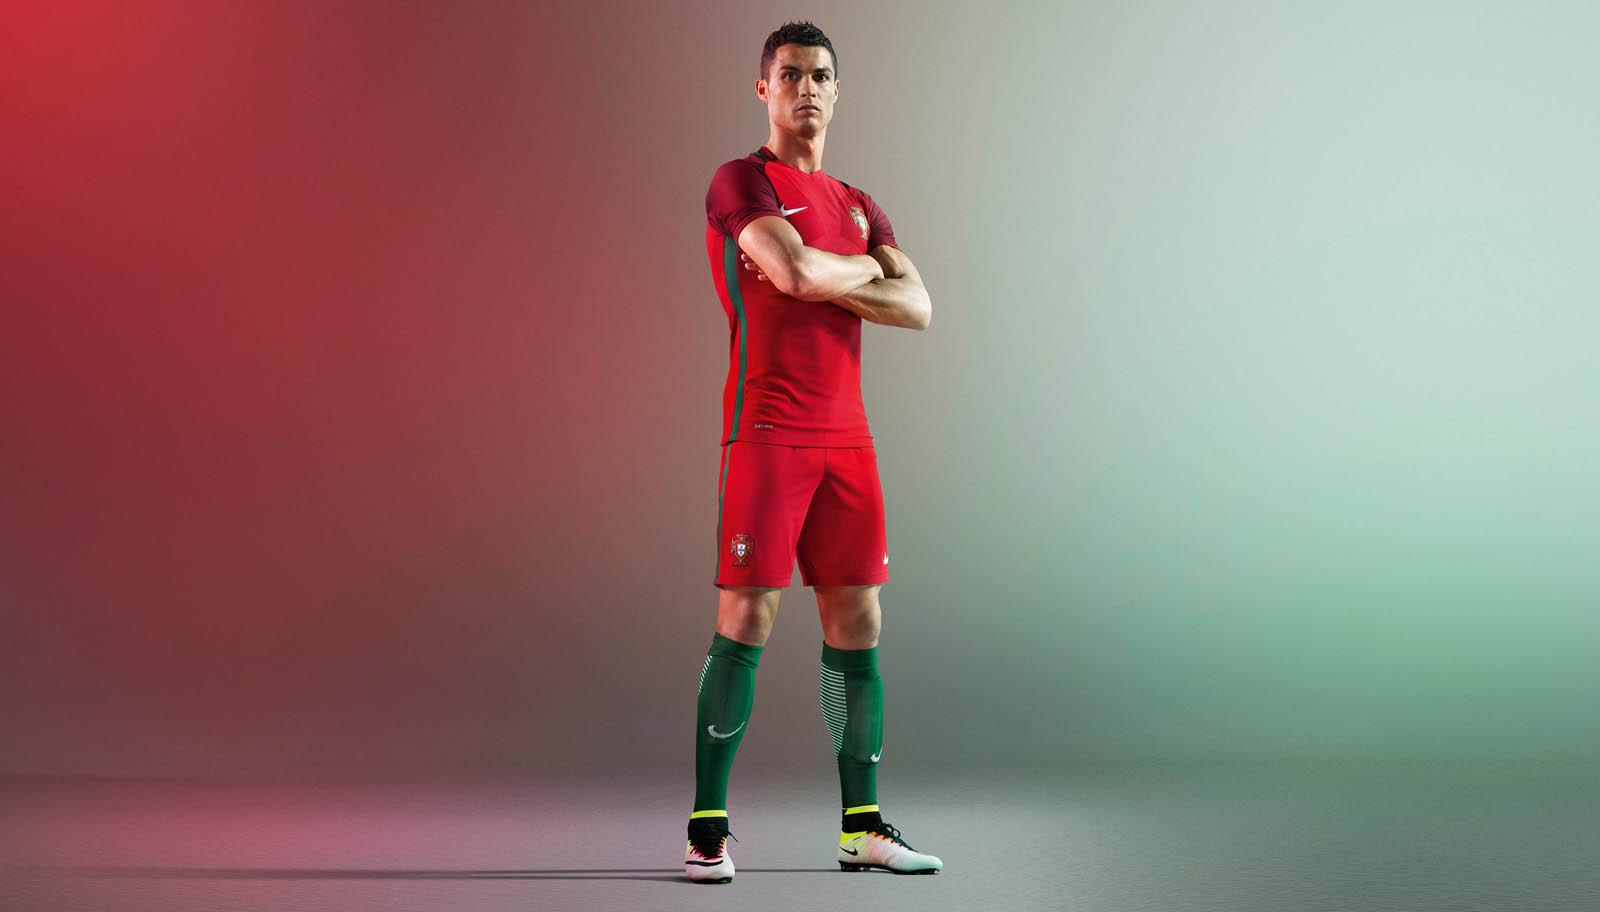 Portugal thuisshirt euro 2016_Ronaldo_cr7